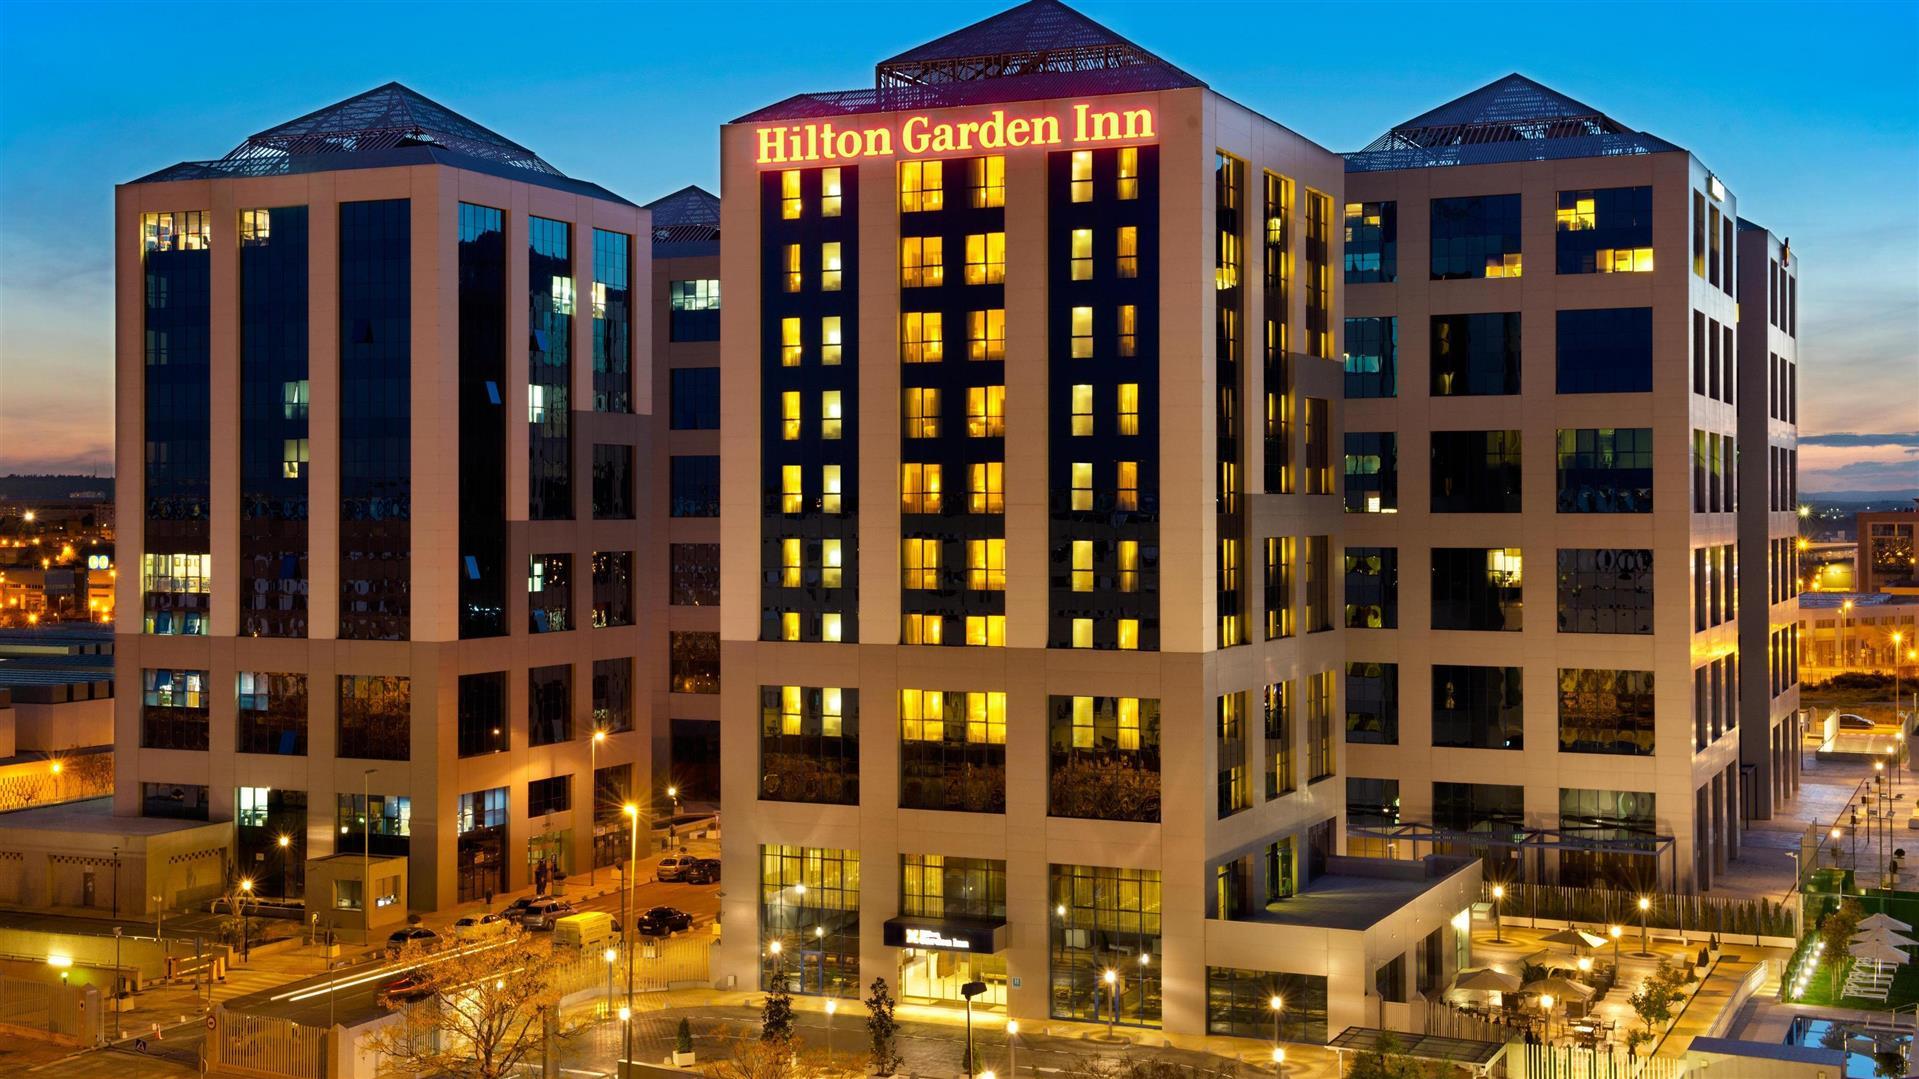 Meetings And Events At Hilton Garden Inn Sevilla Sevilla Es